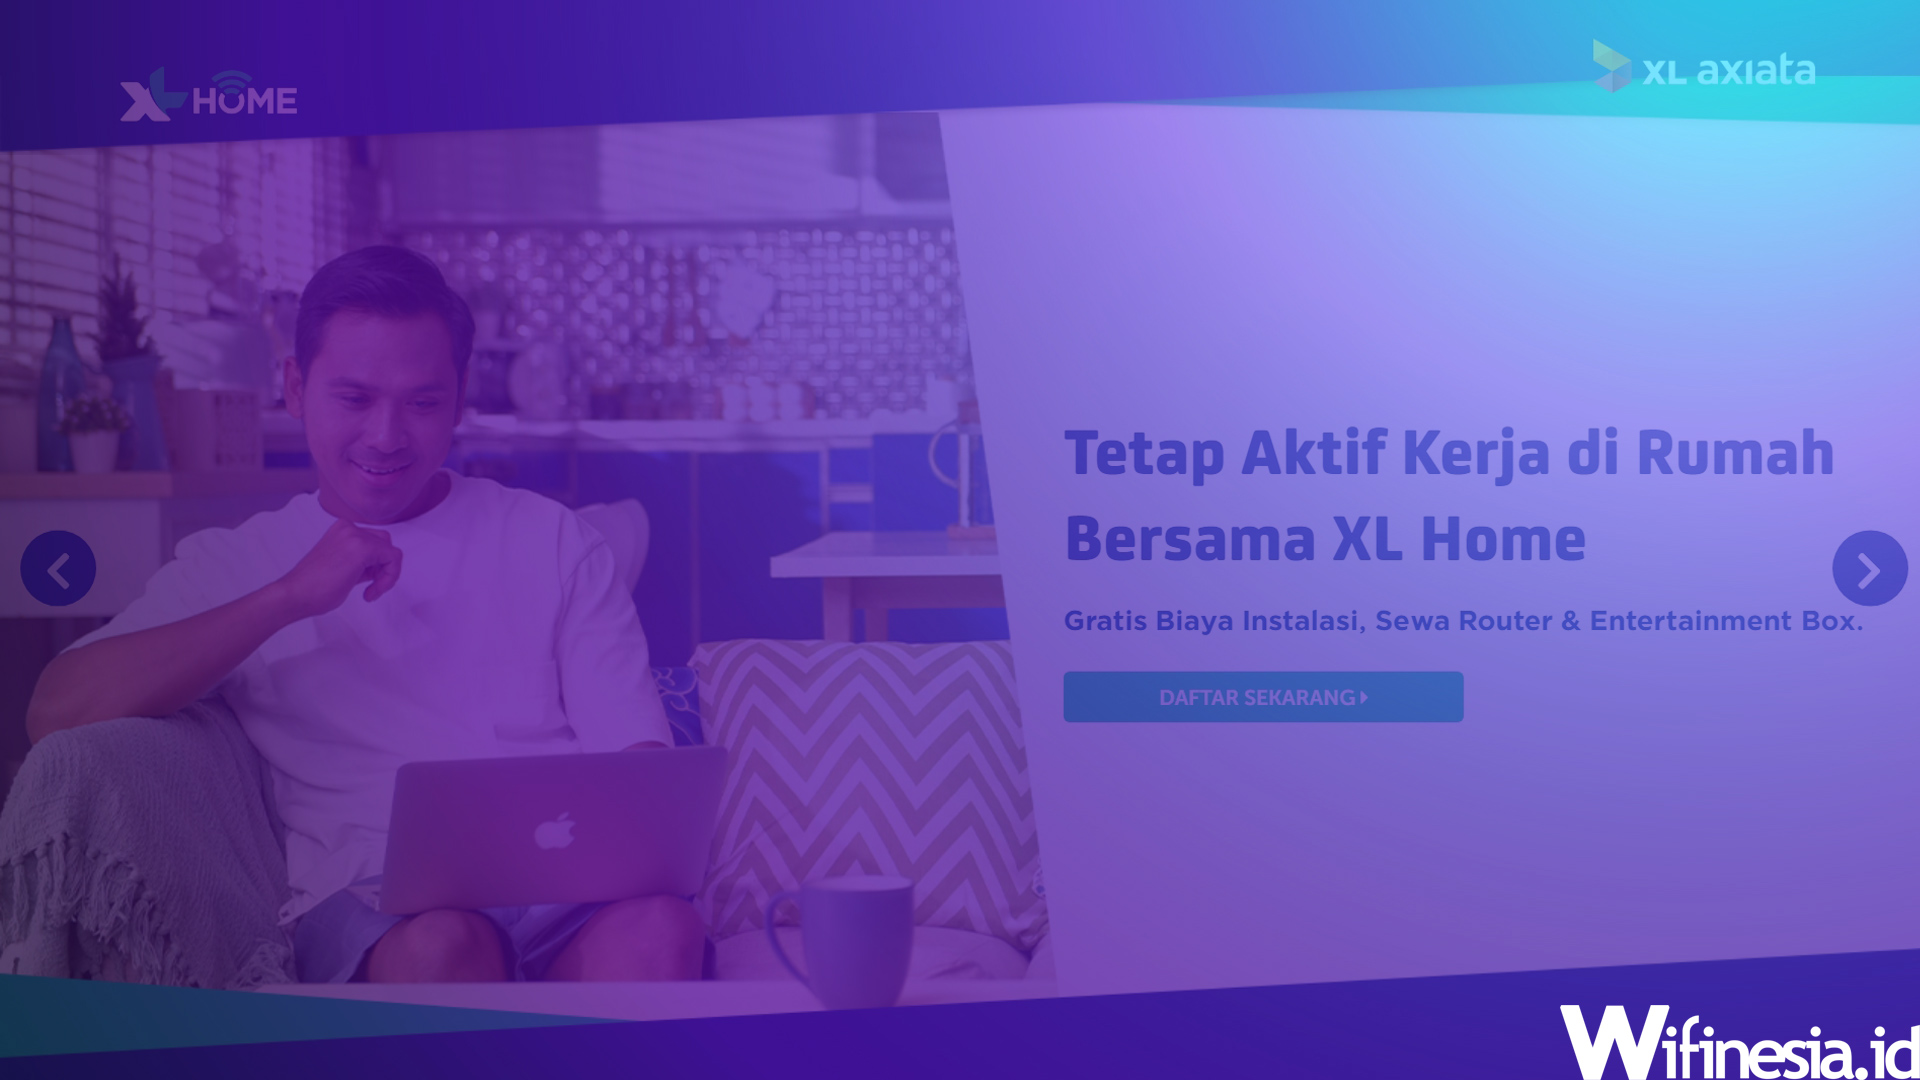 Harga Paket XL Home Fiber 2020 WiFi Murah Unlimited